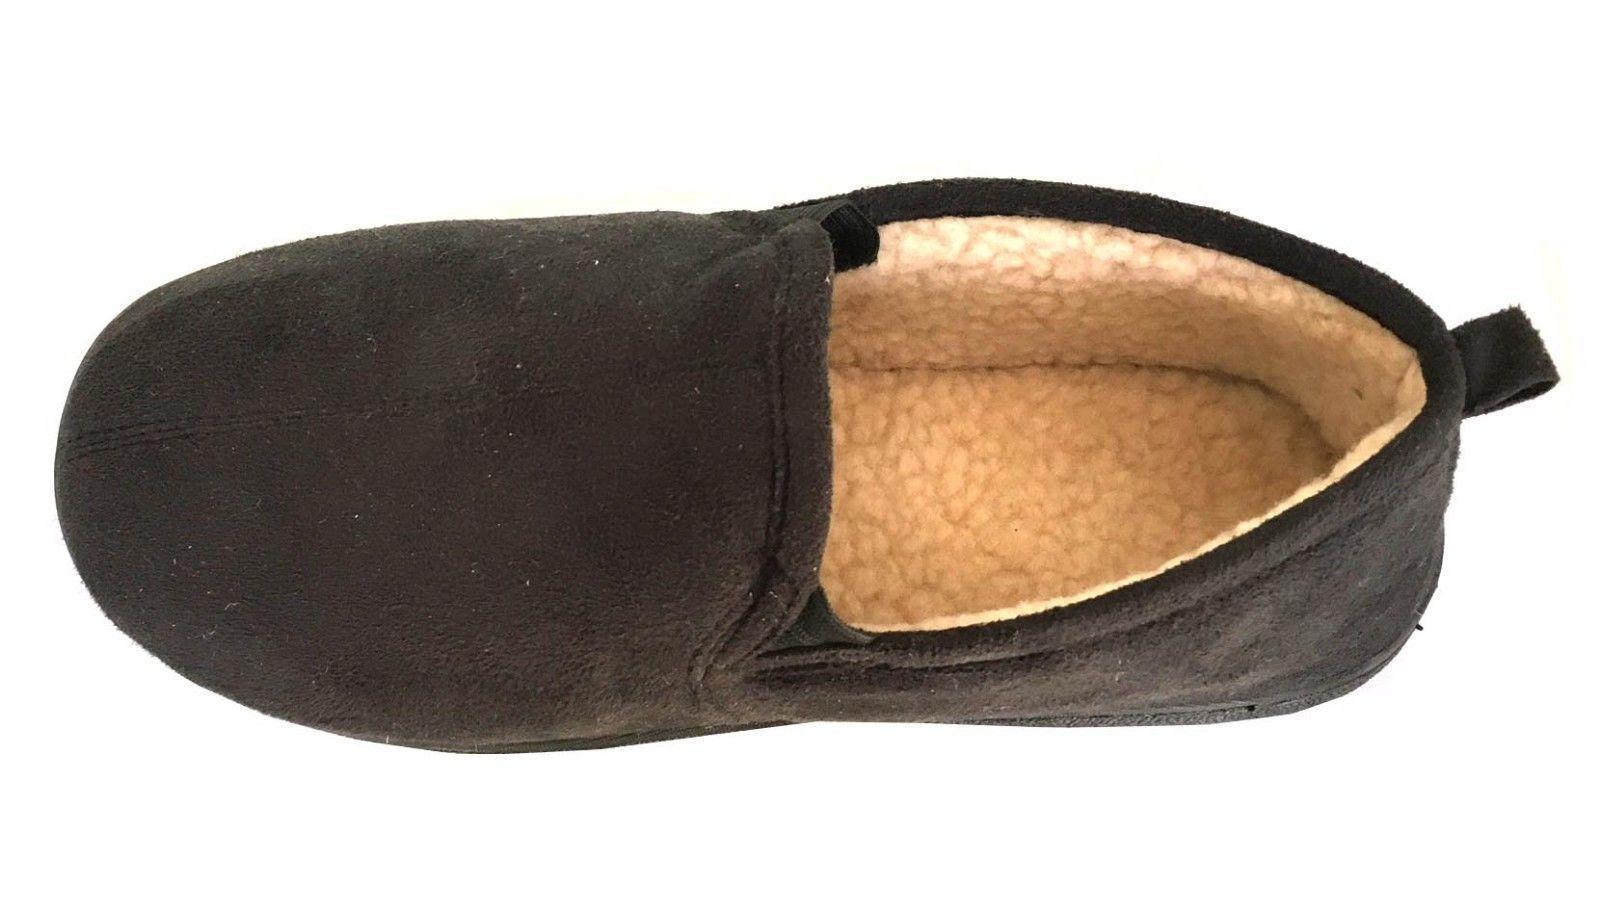 New Men's Fur Classic Moccasin Slipper Rubber Bottom Suede Faux Fur Men's Slip on-0220 19df74